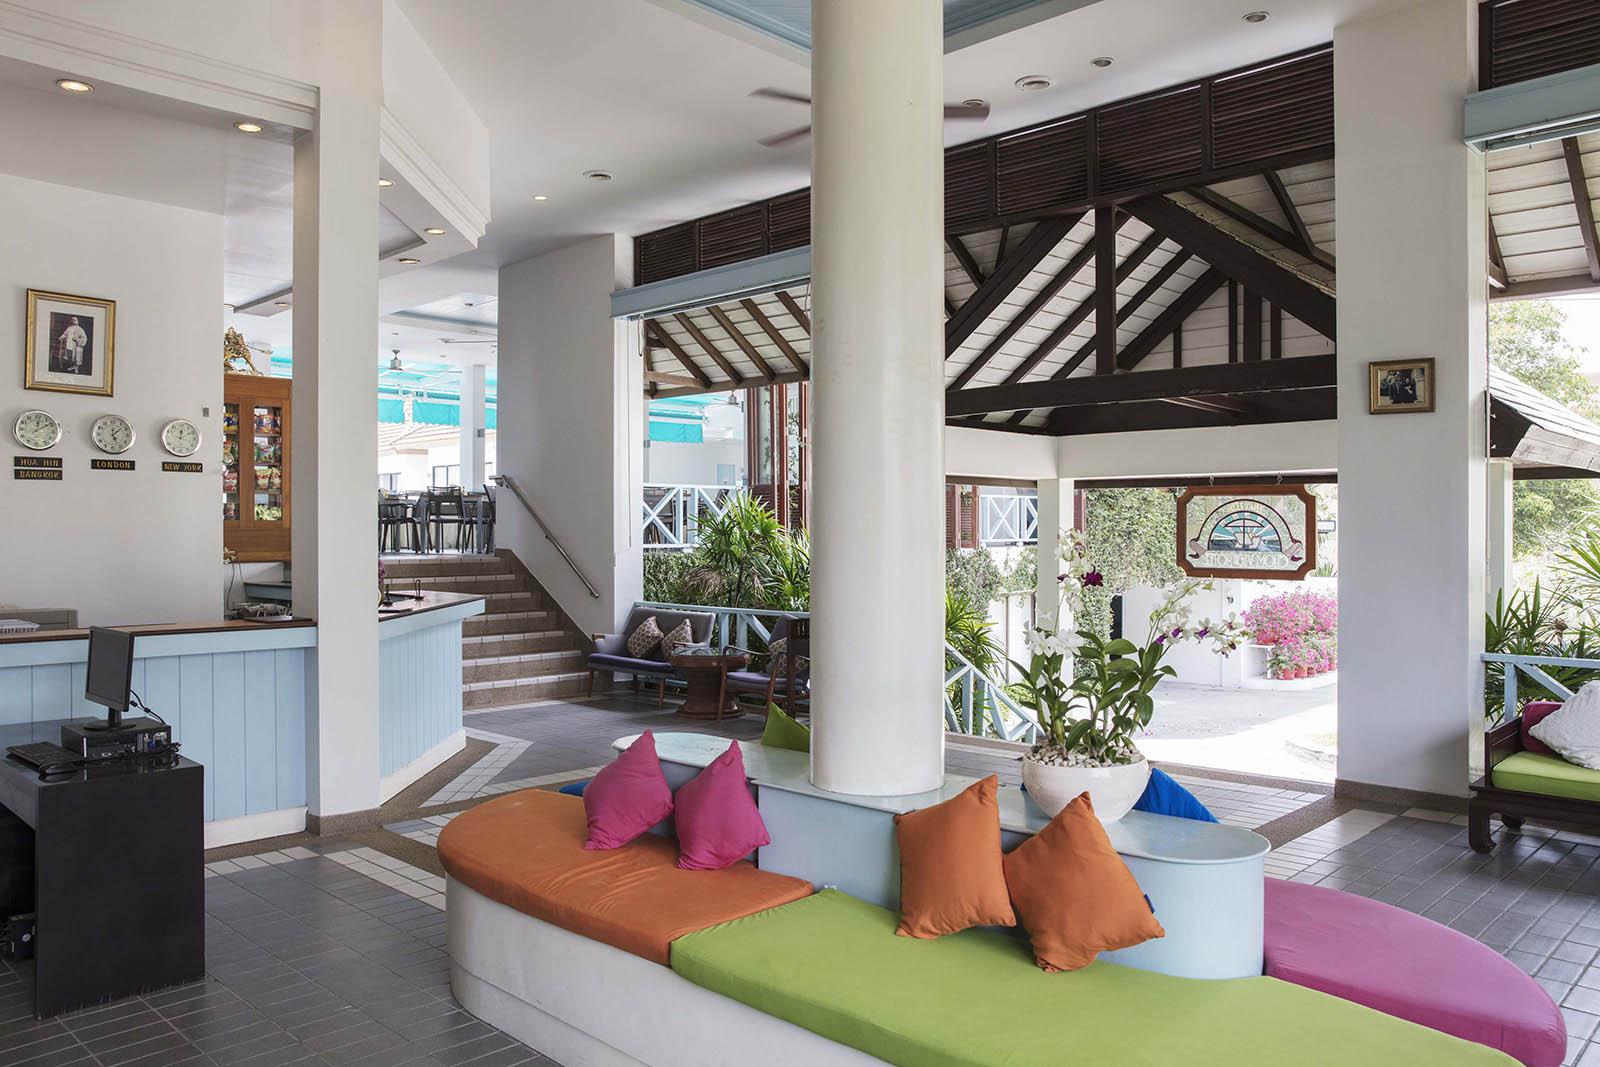 03-Chom-View-Hotel-Lobby